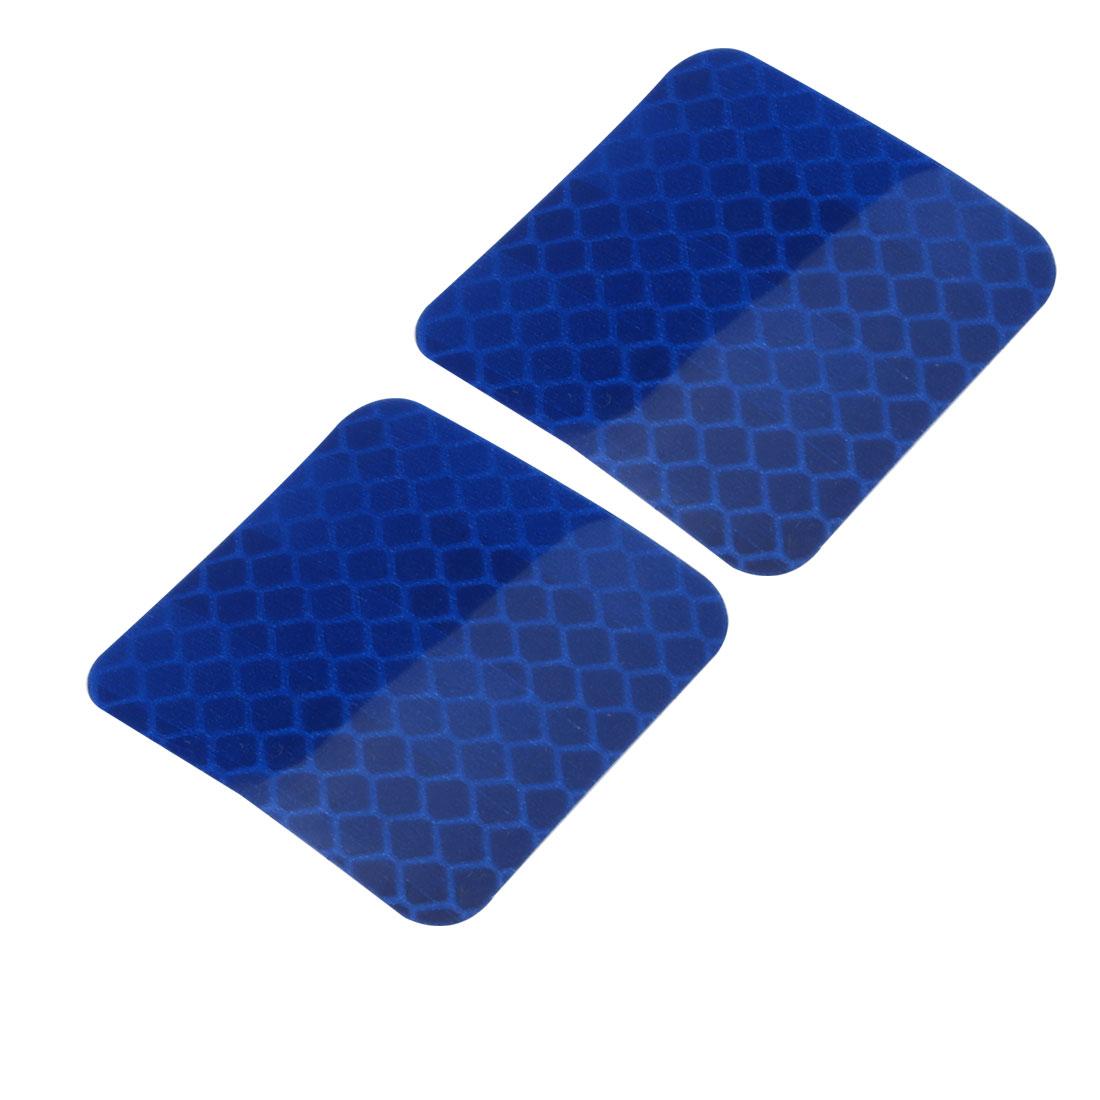 2pcs Honeycomb Reflective Warning Tape Film Sticker Blue 40mm x 40mm